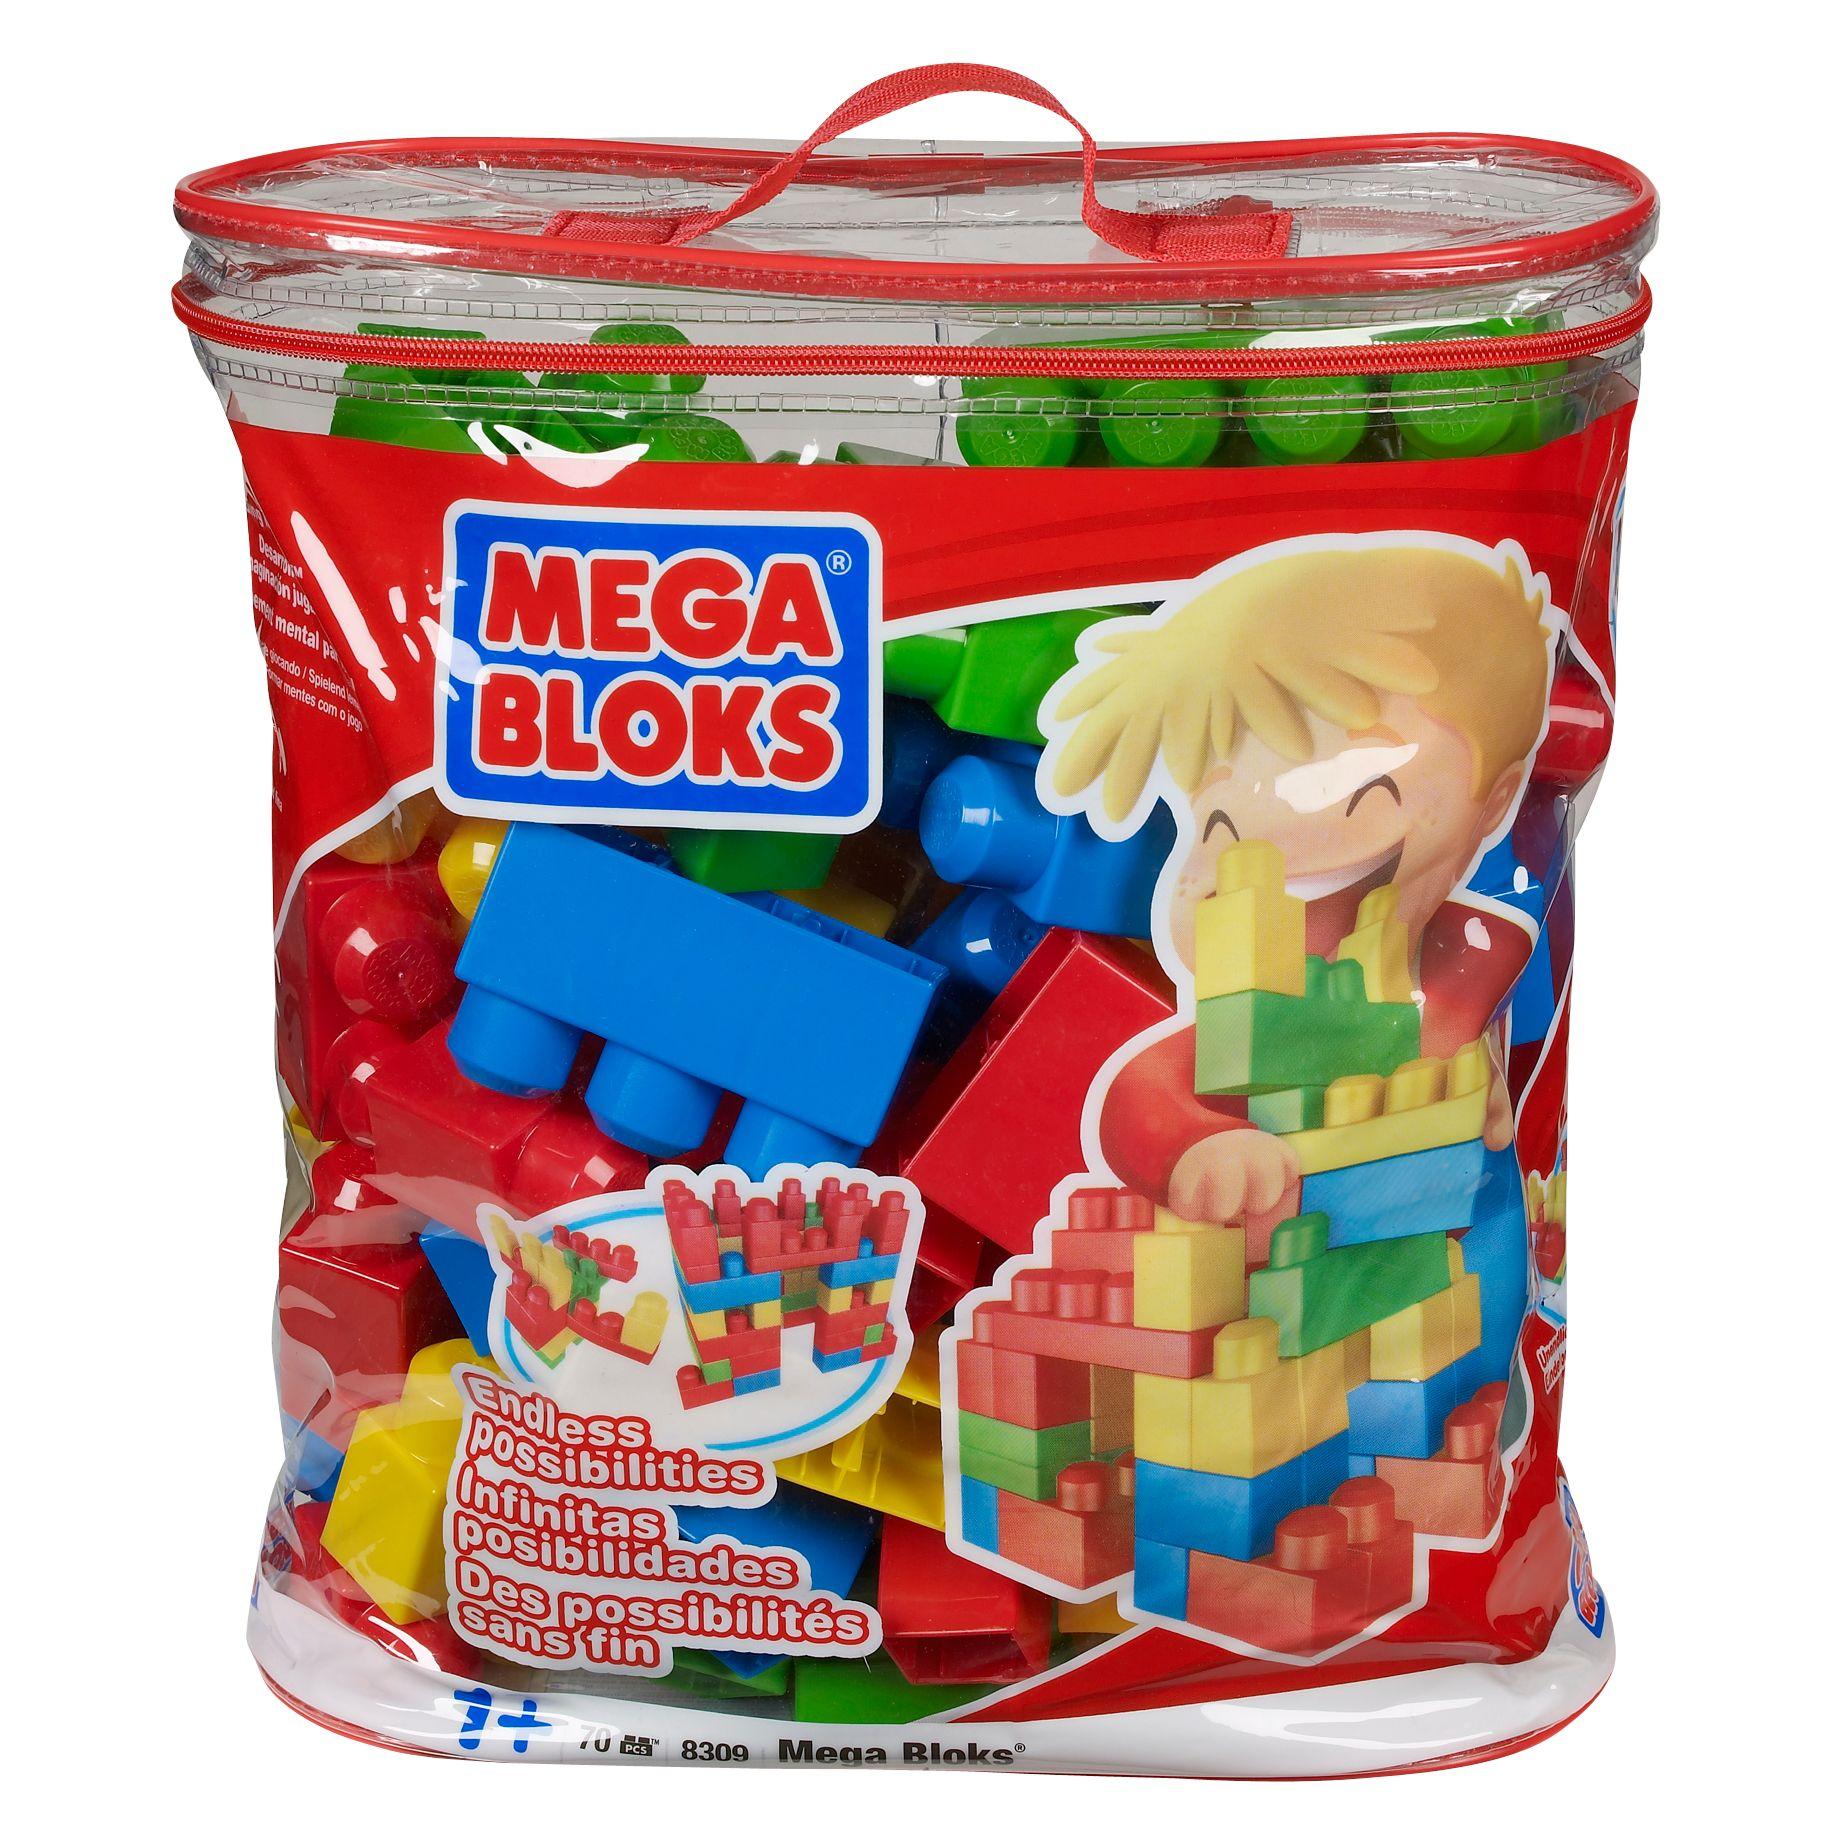 Mega Bloks 70 Piece Building Set, Red